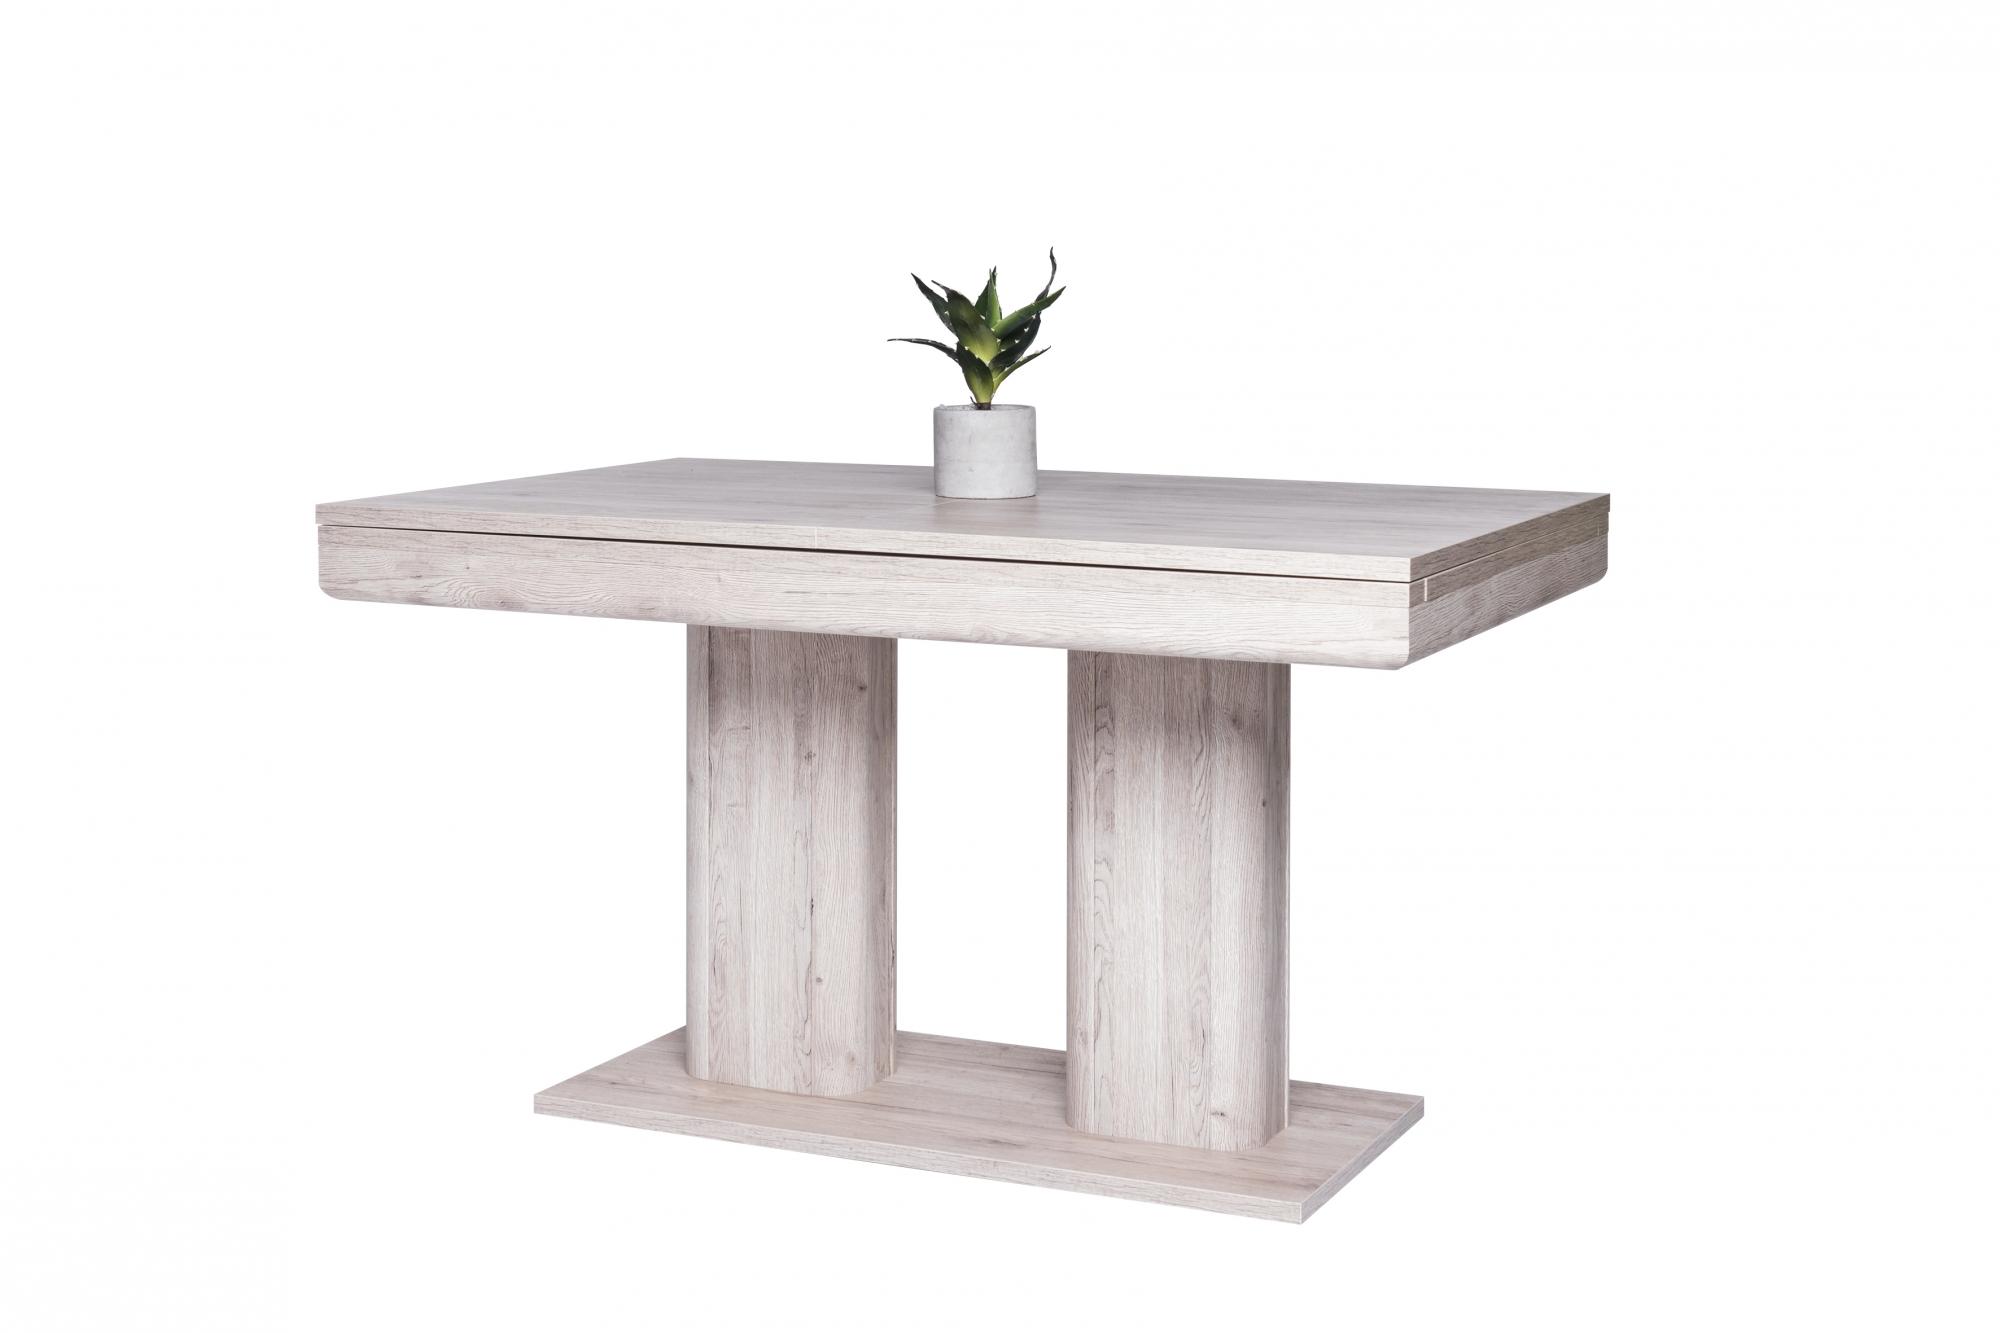 Jídelní stůl rozkládací Hayden, 220 cm, Sorrento dub